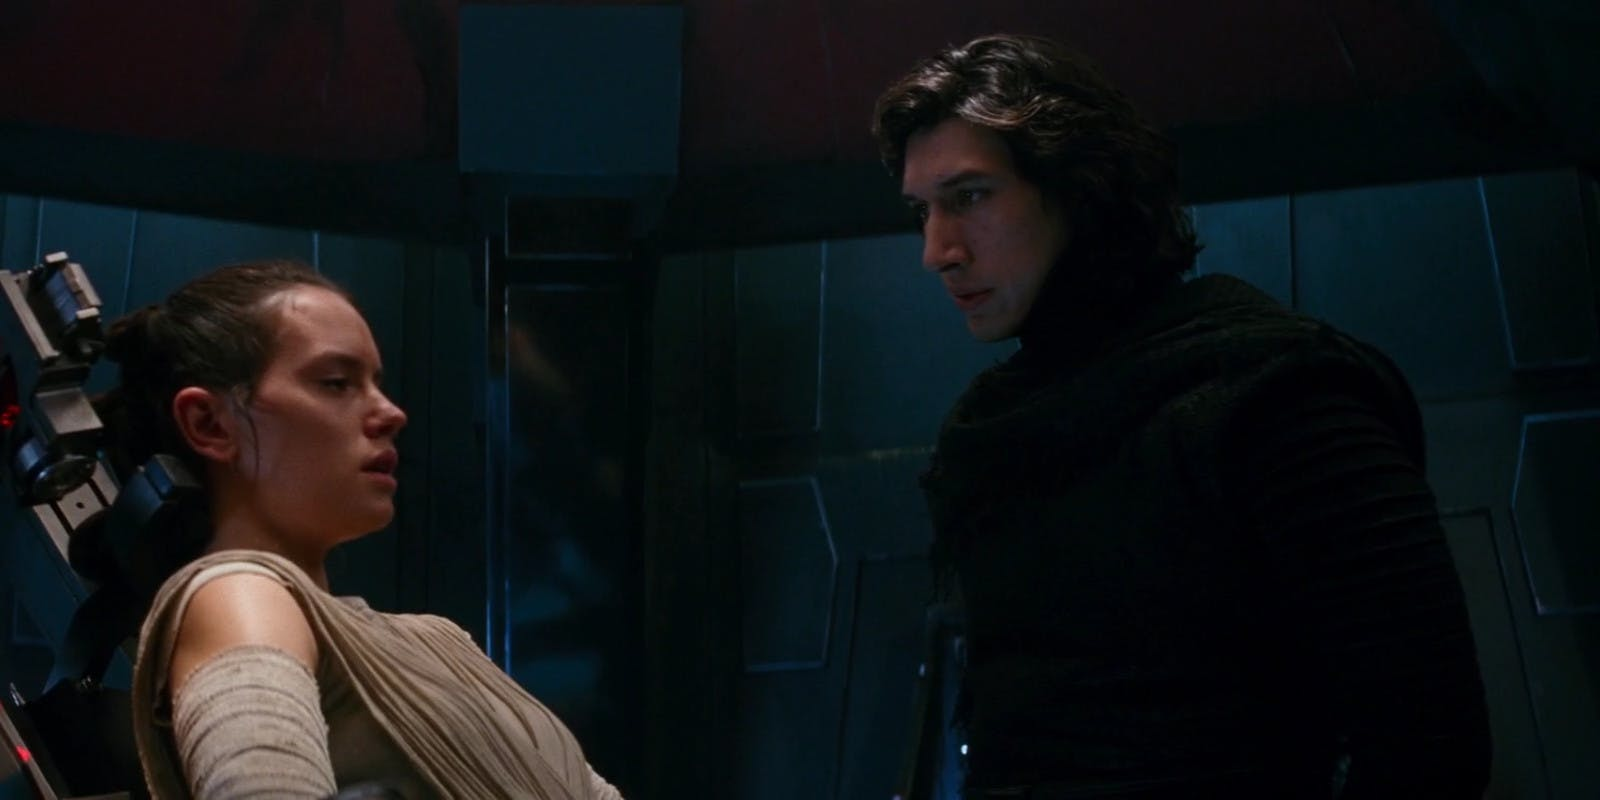 Kylo interrogates Rey in Star Wars: The Force Awakens